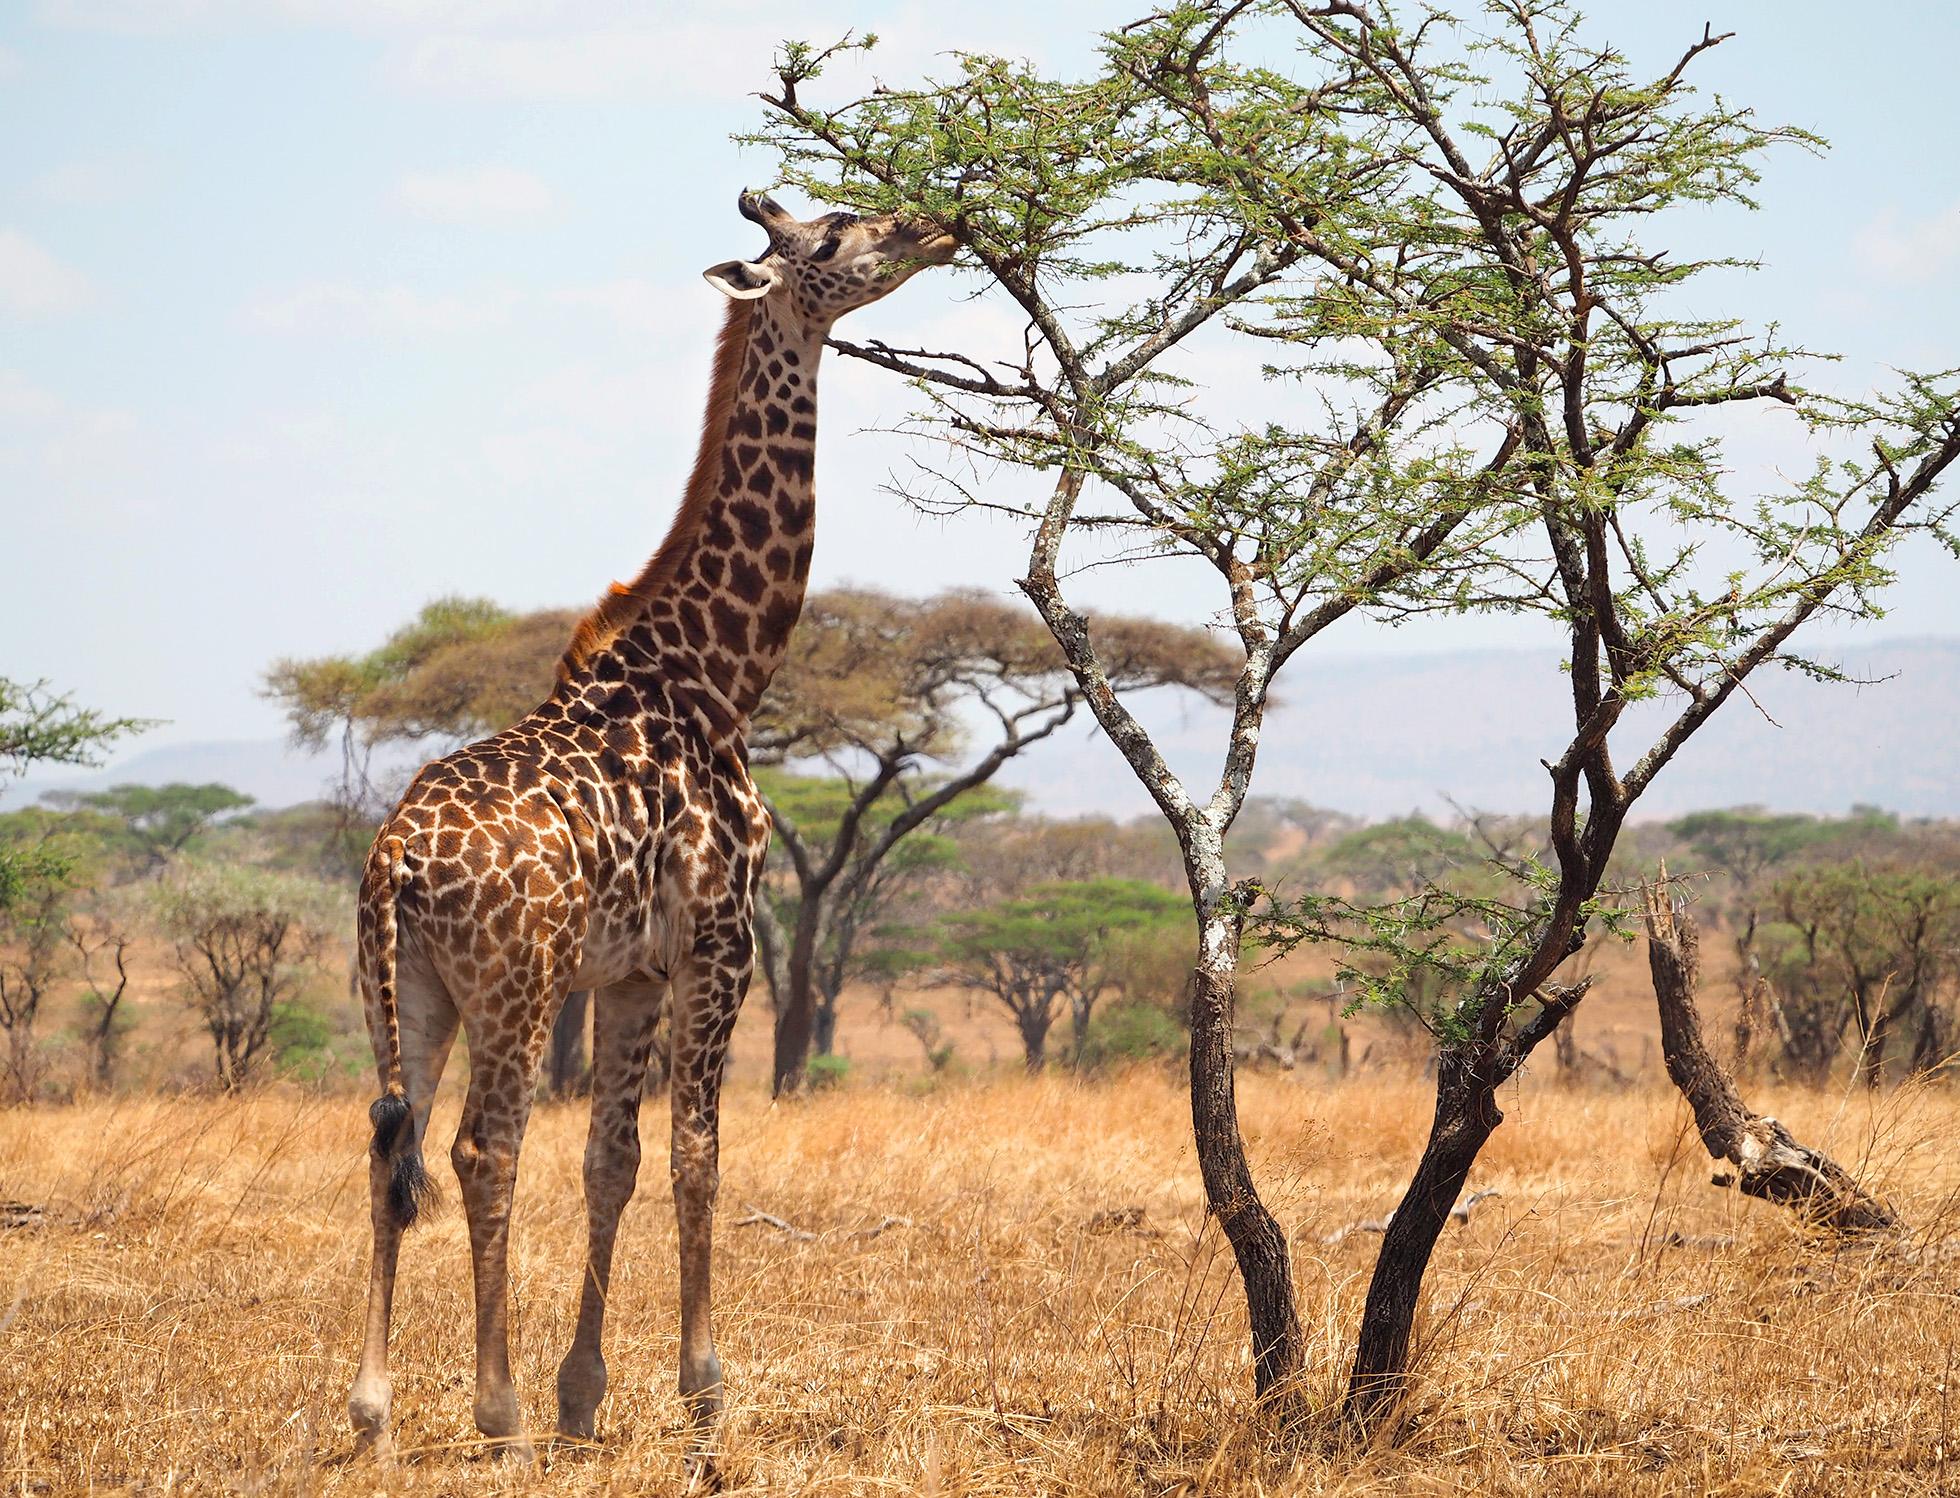 The Masai giraffe (Giraffa tippelskirchi), also called Kilimanjaro giraffe, is the largest species of giraffe and the tallest land mammal.